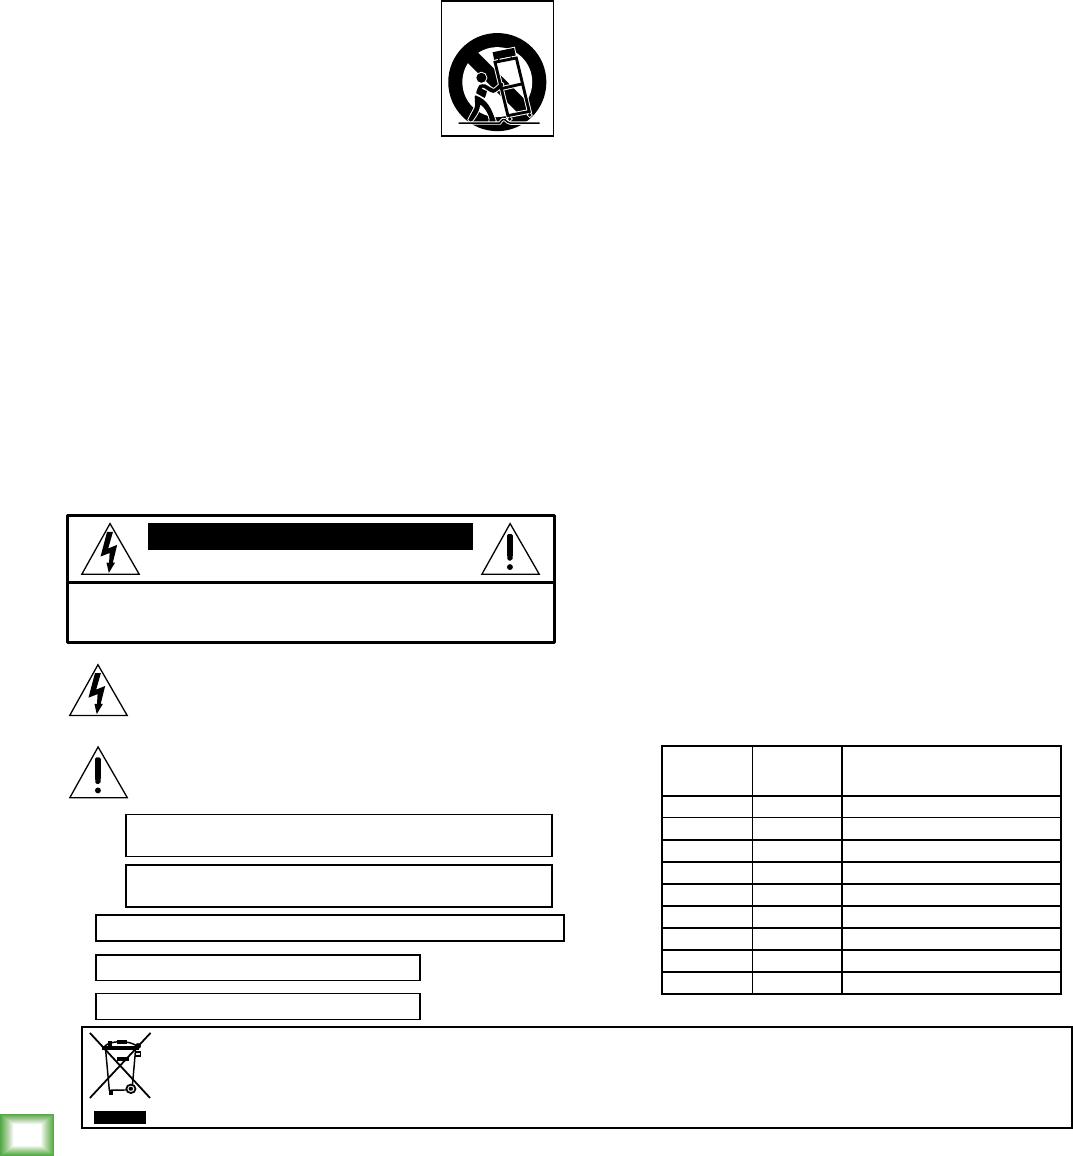 Mackie Reach User Manual To The C75689ae Da0a 42ce Bfc7 E20499f798df Wiring Diagrams Professional Pa System